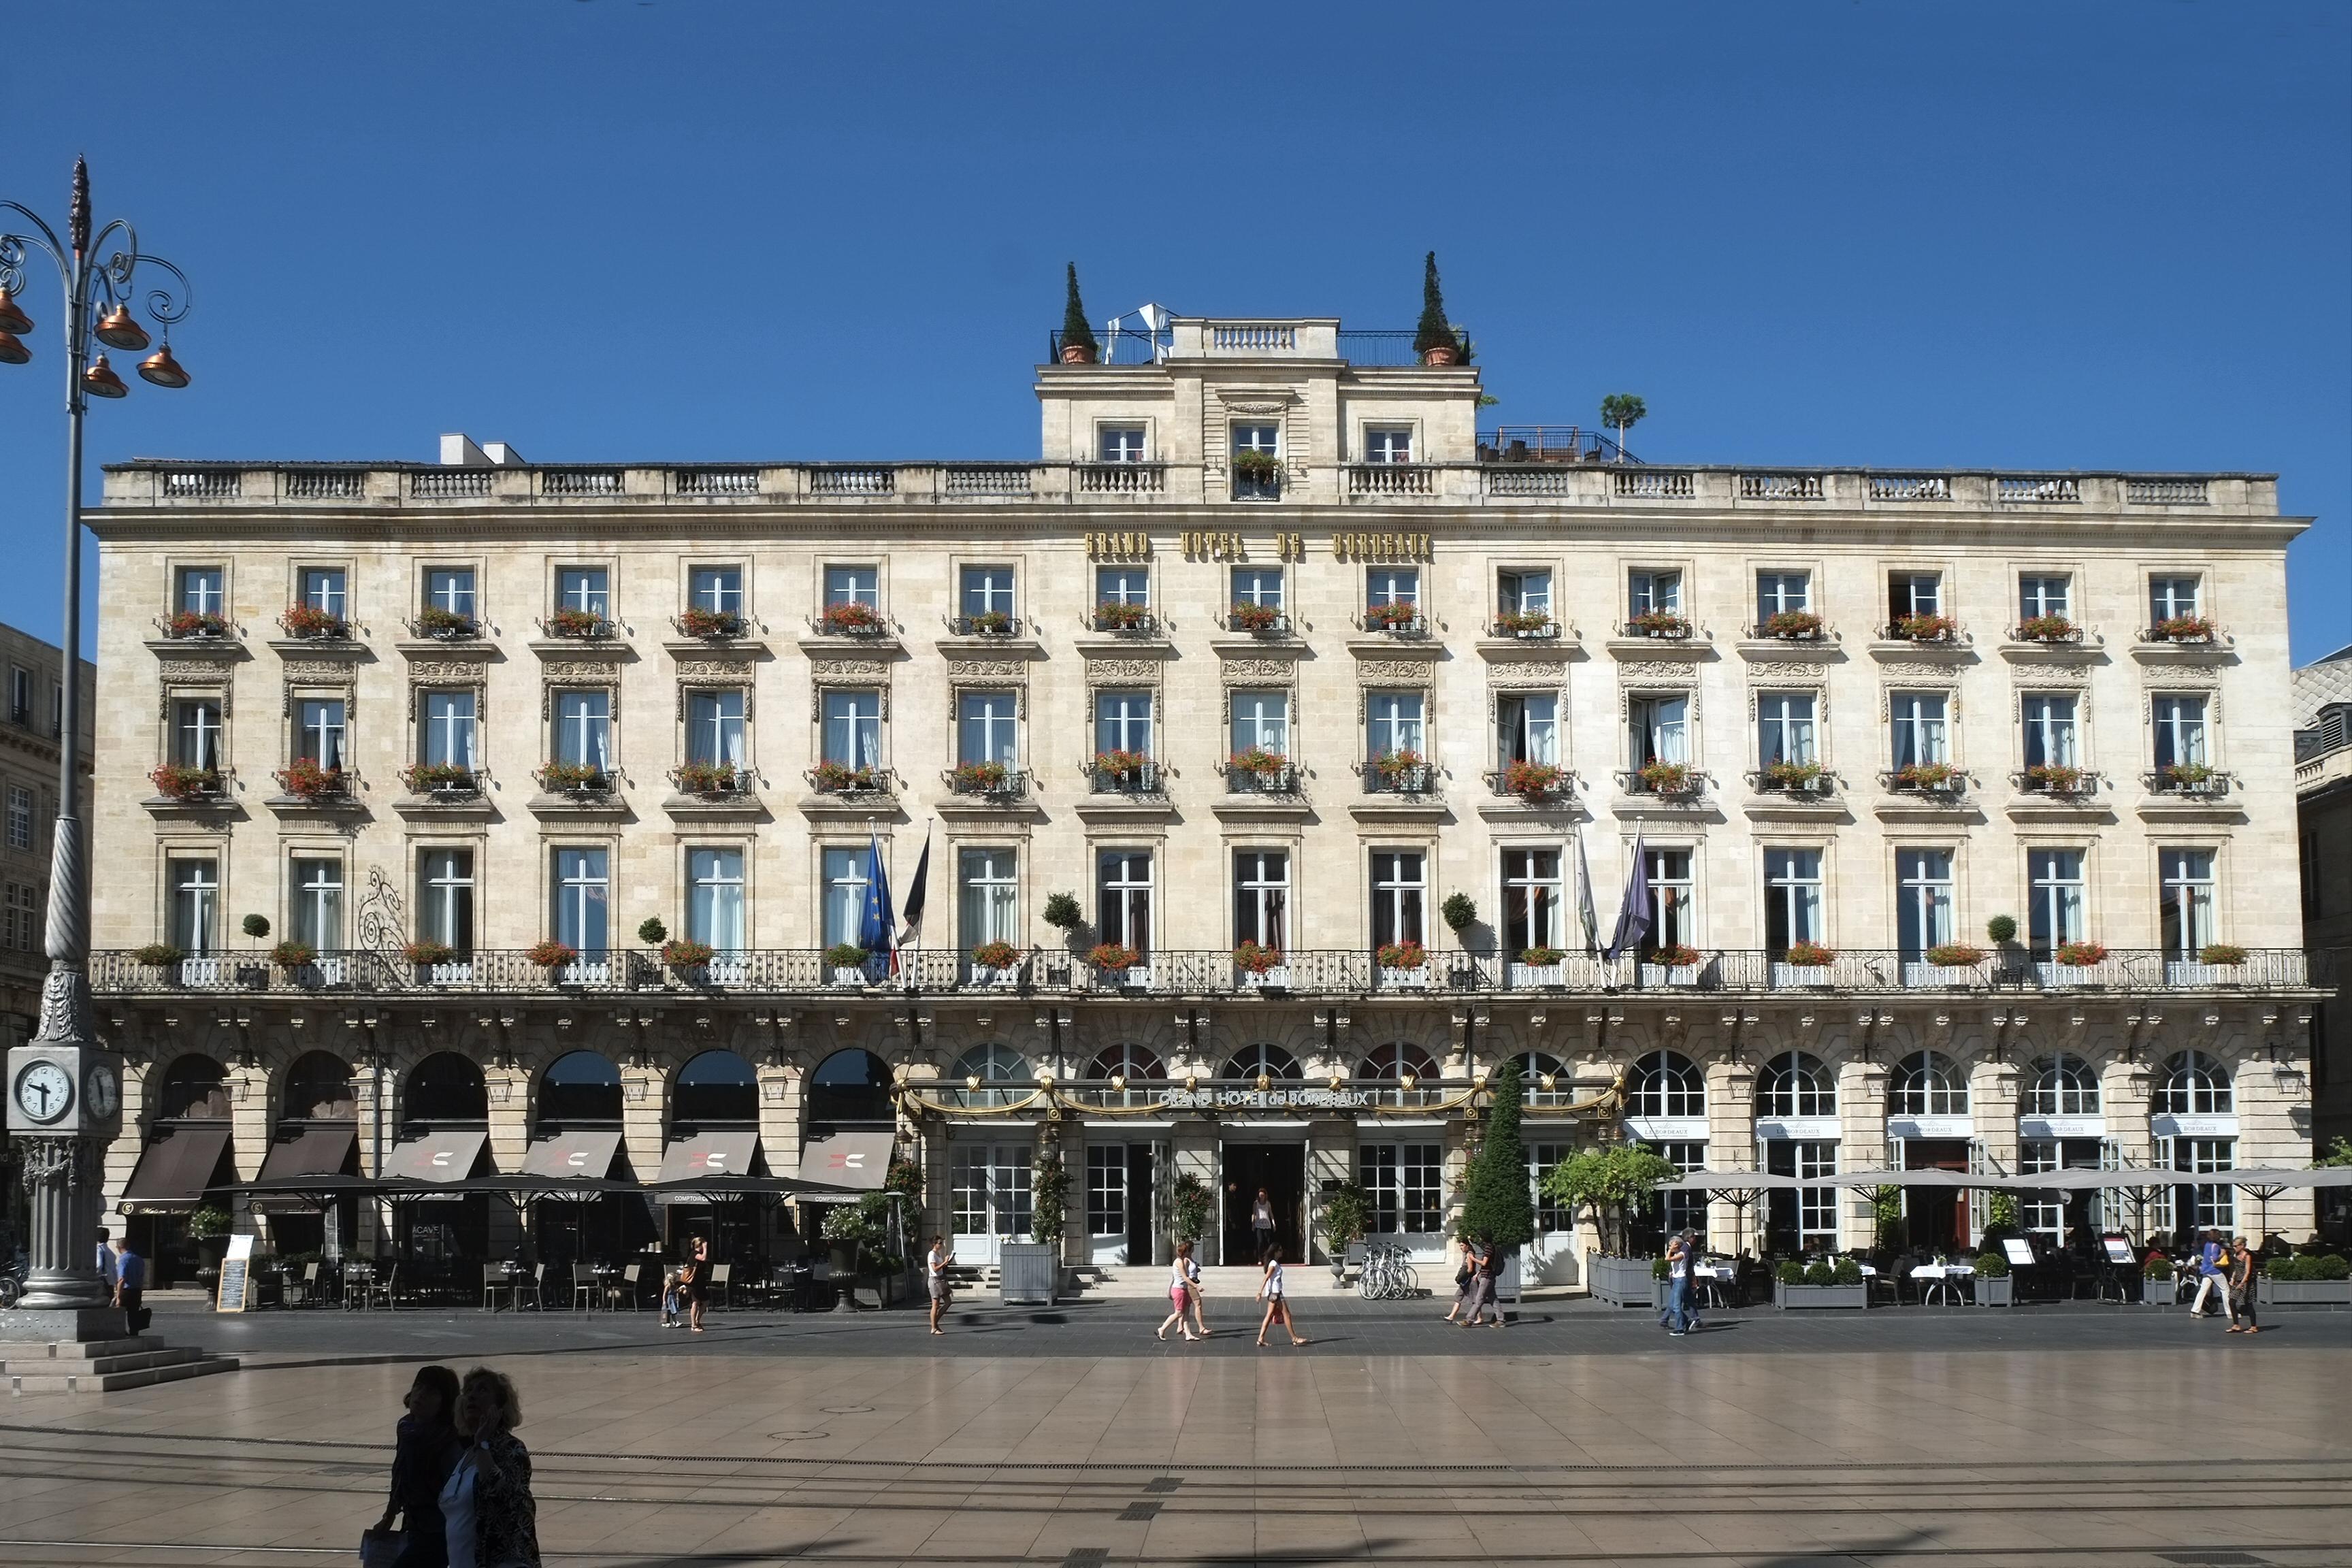 The Grand Hotel Bordeaux